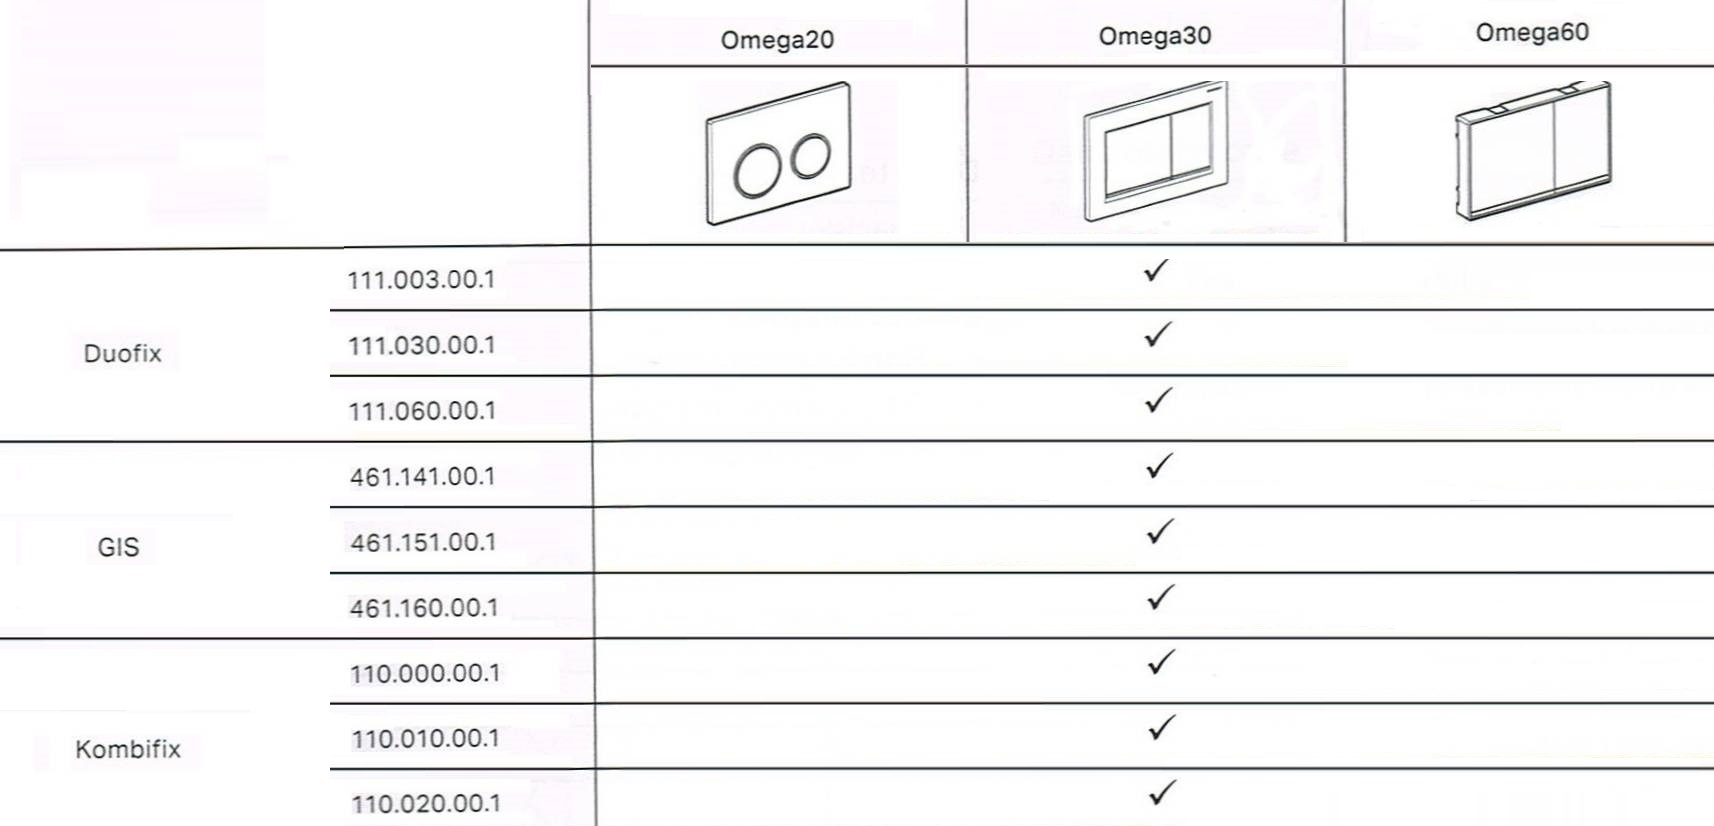 omega-przyciski0pn8vRk6wFNAO